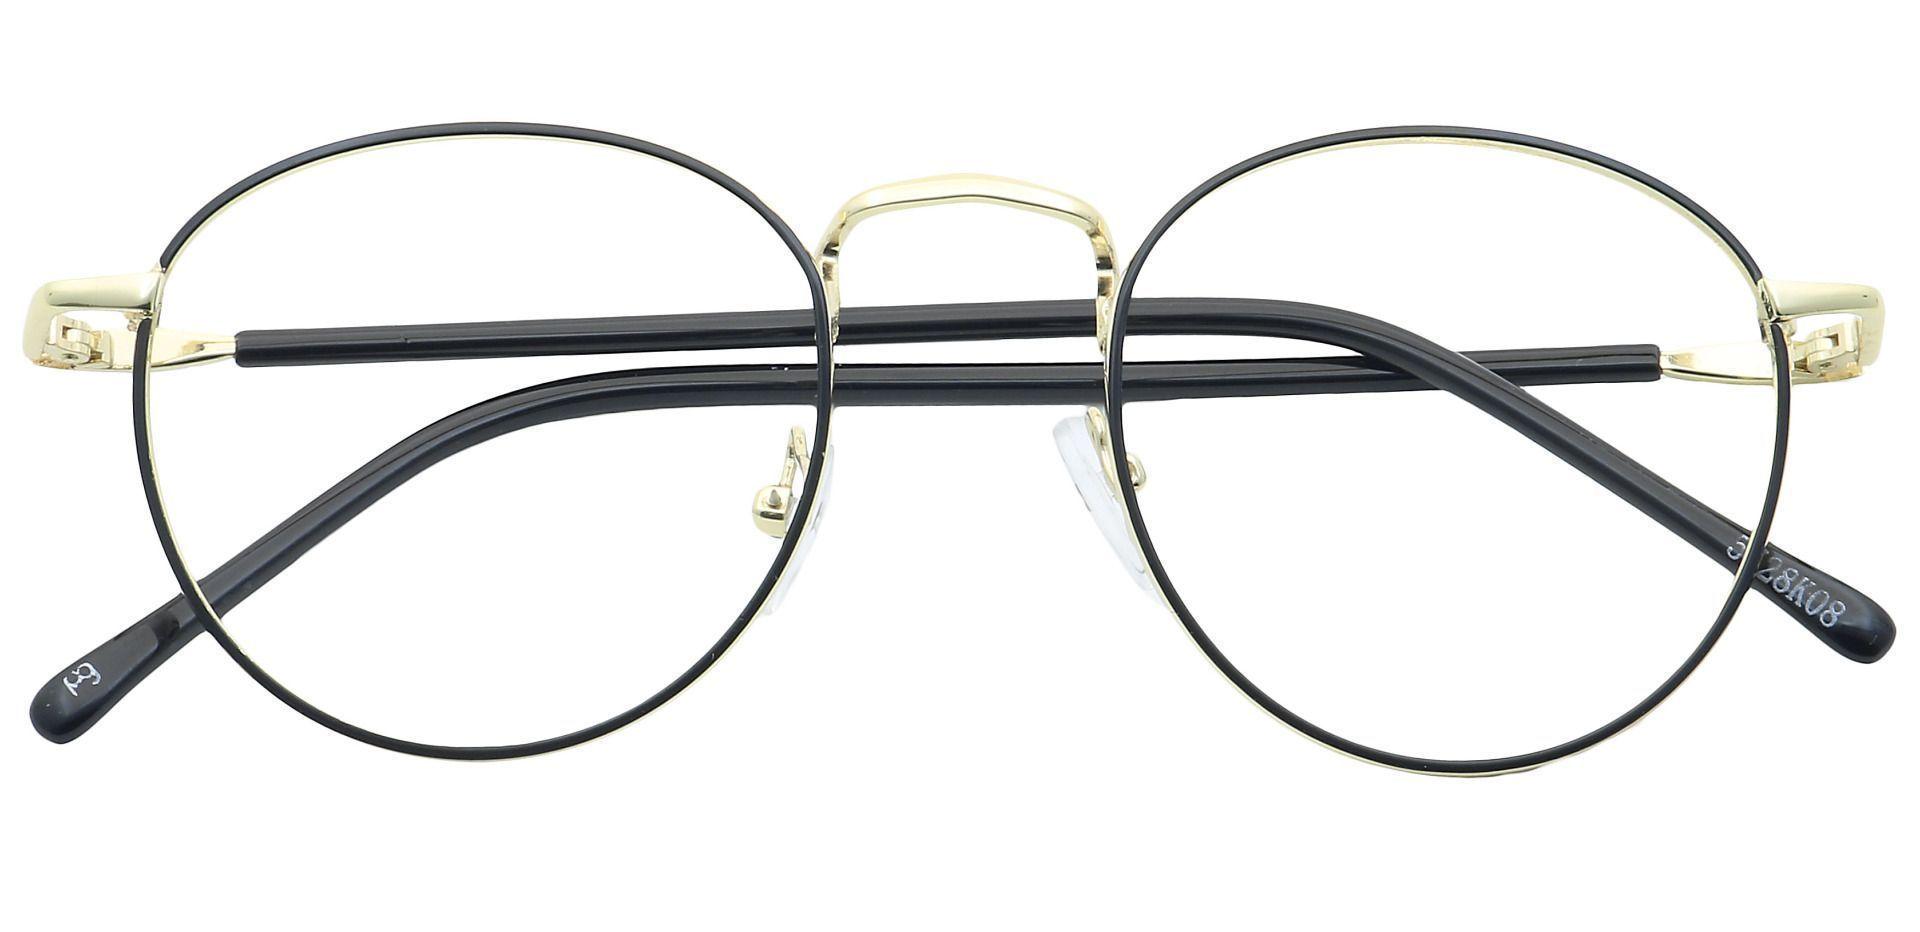 Rani Round Prescription Glasses - Black